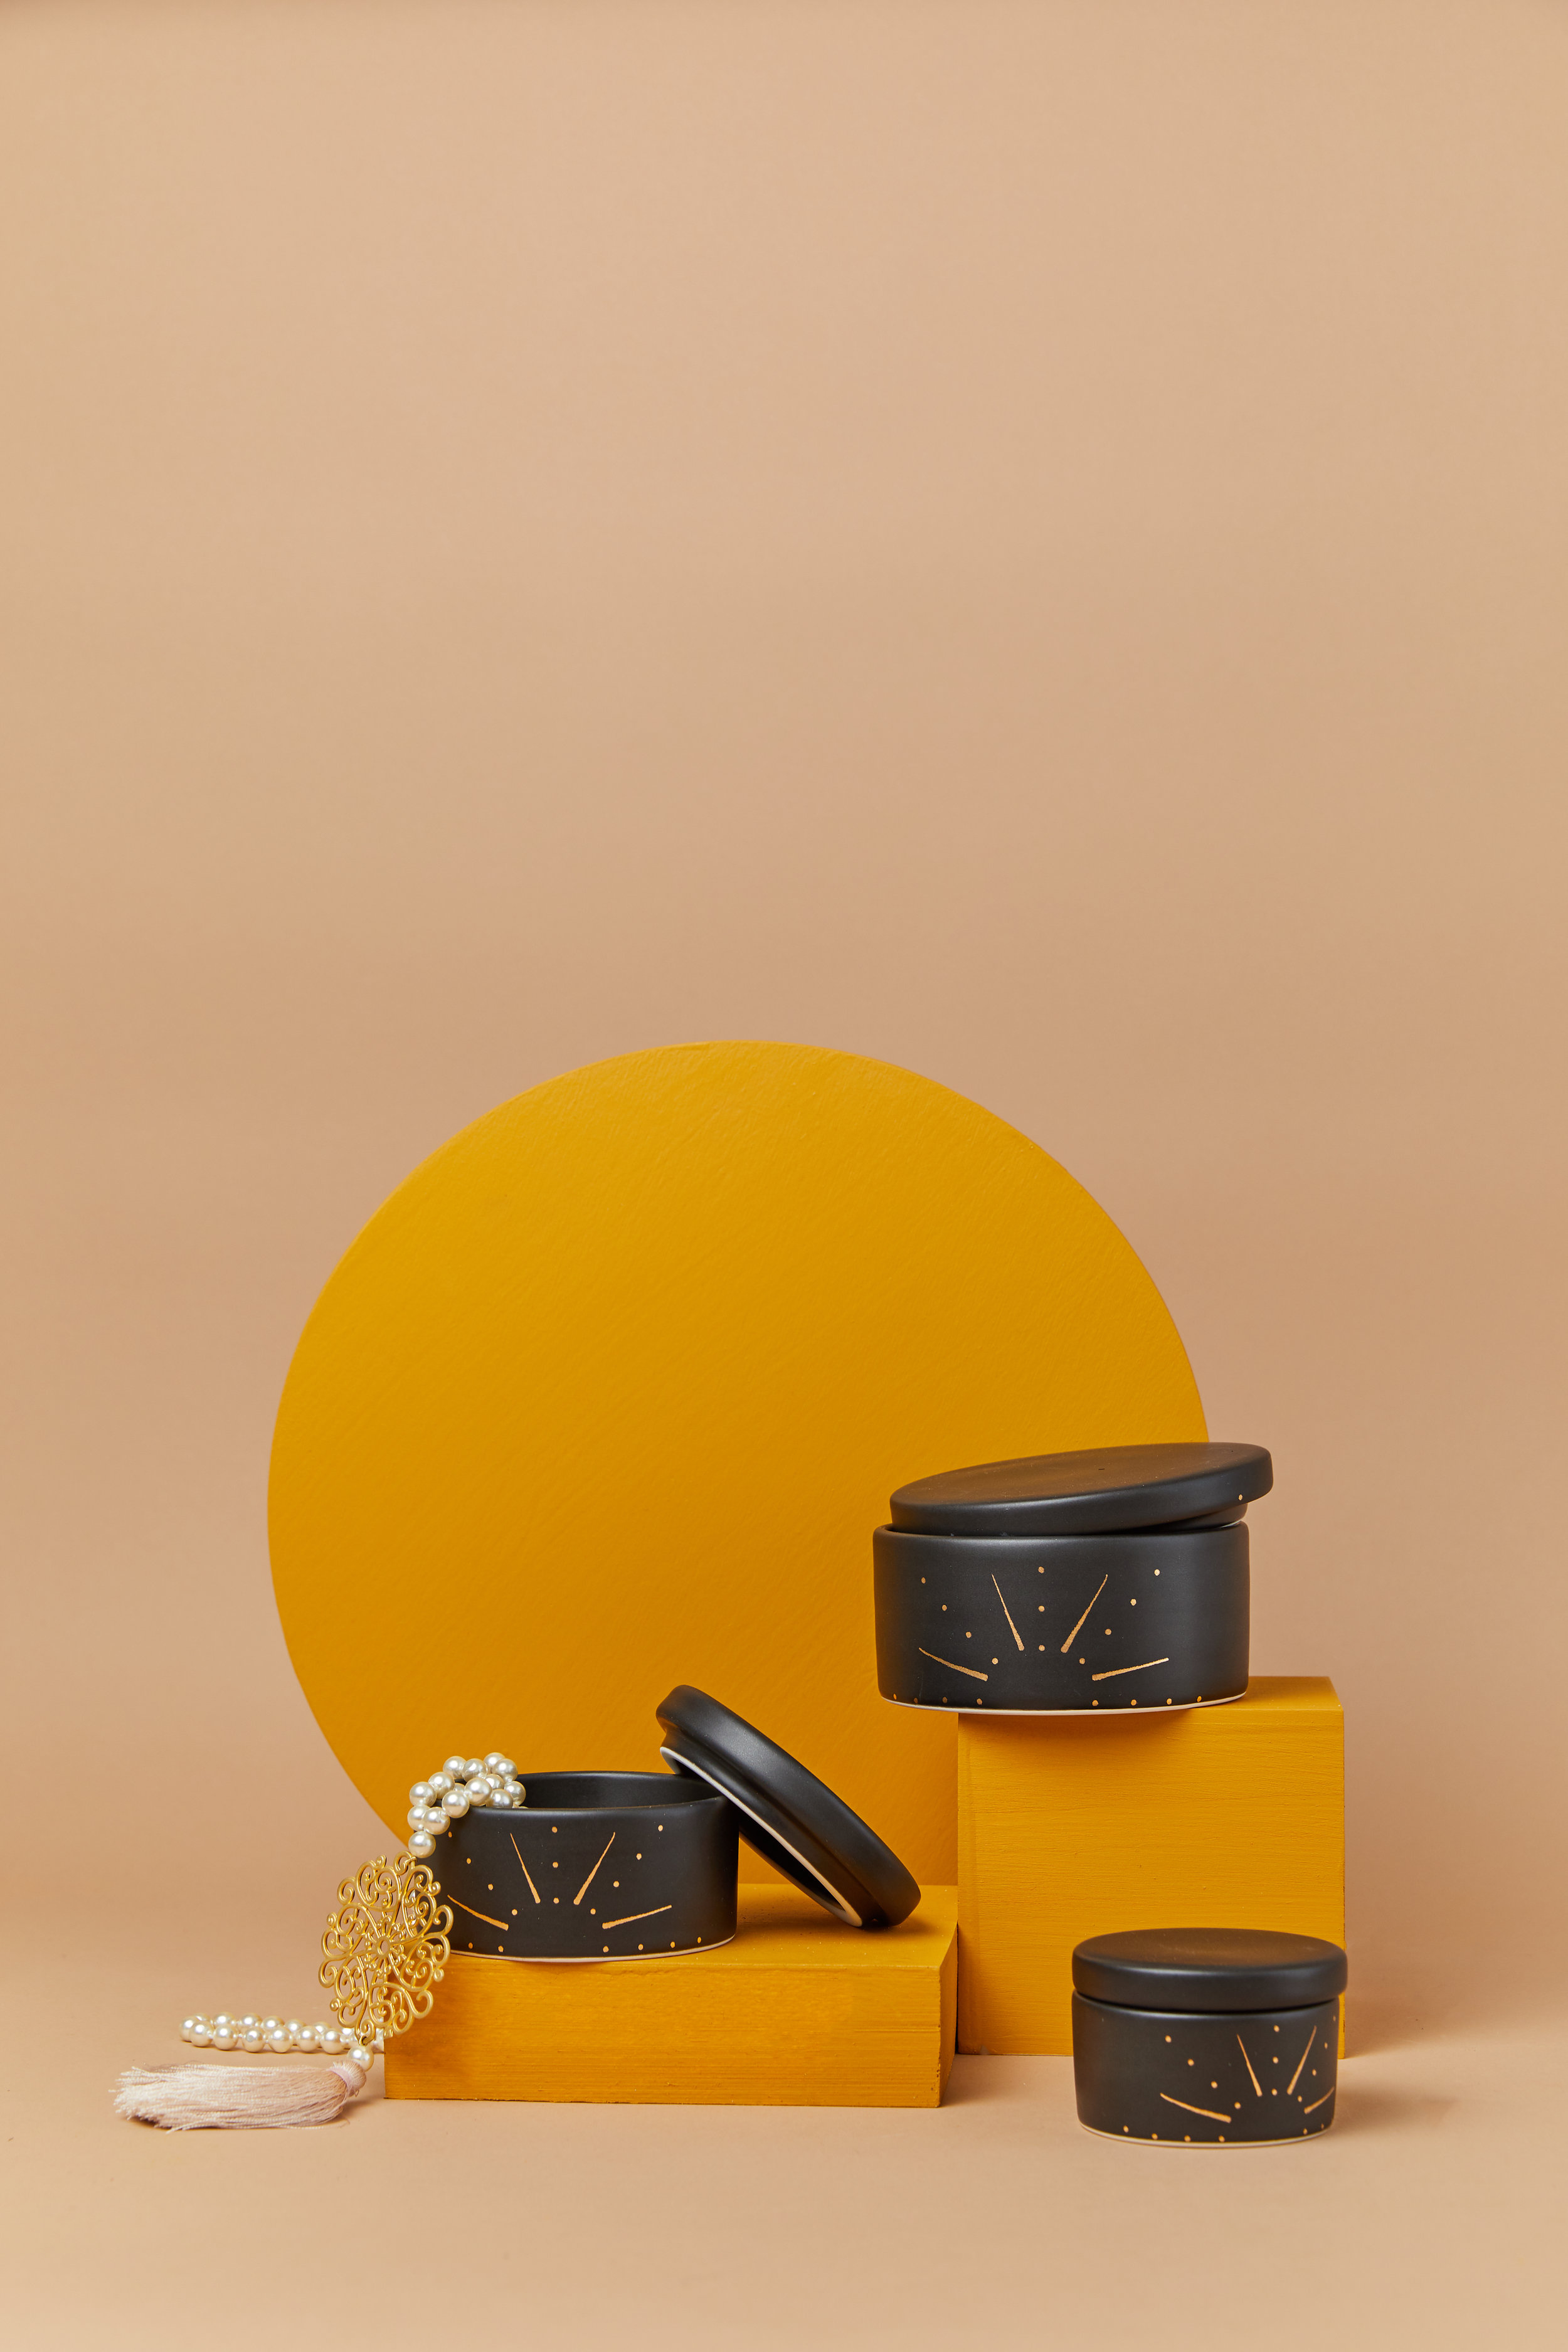 Stash jars by Amy Hamley Ceramics.